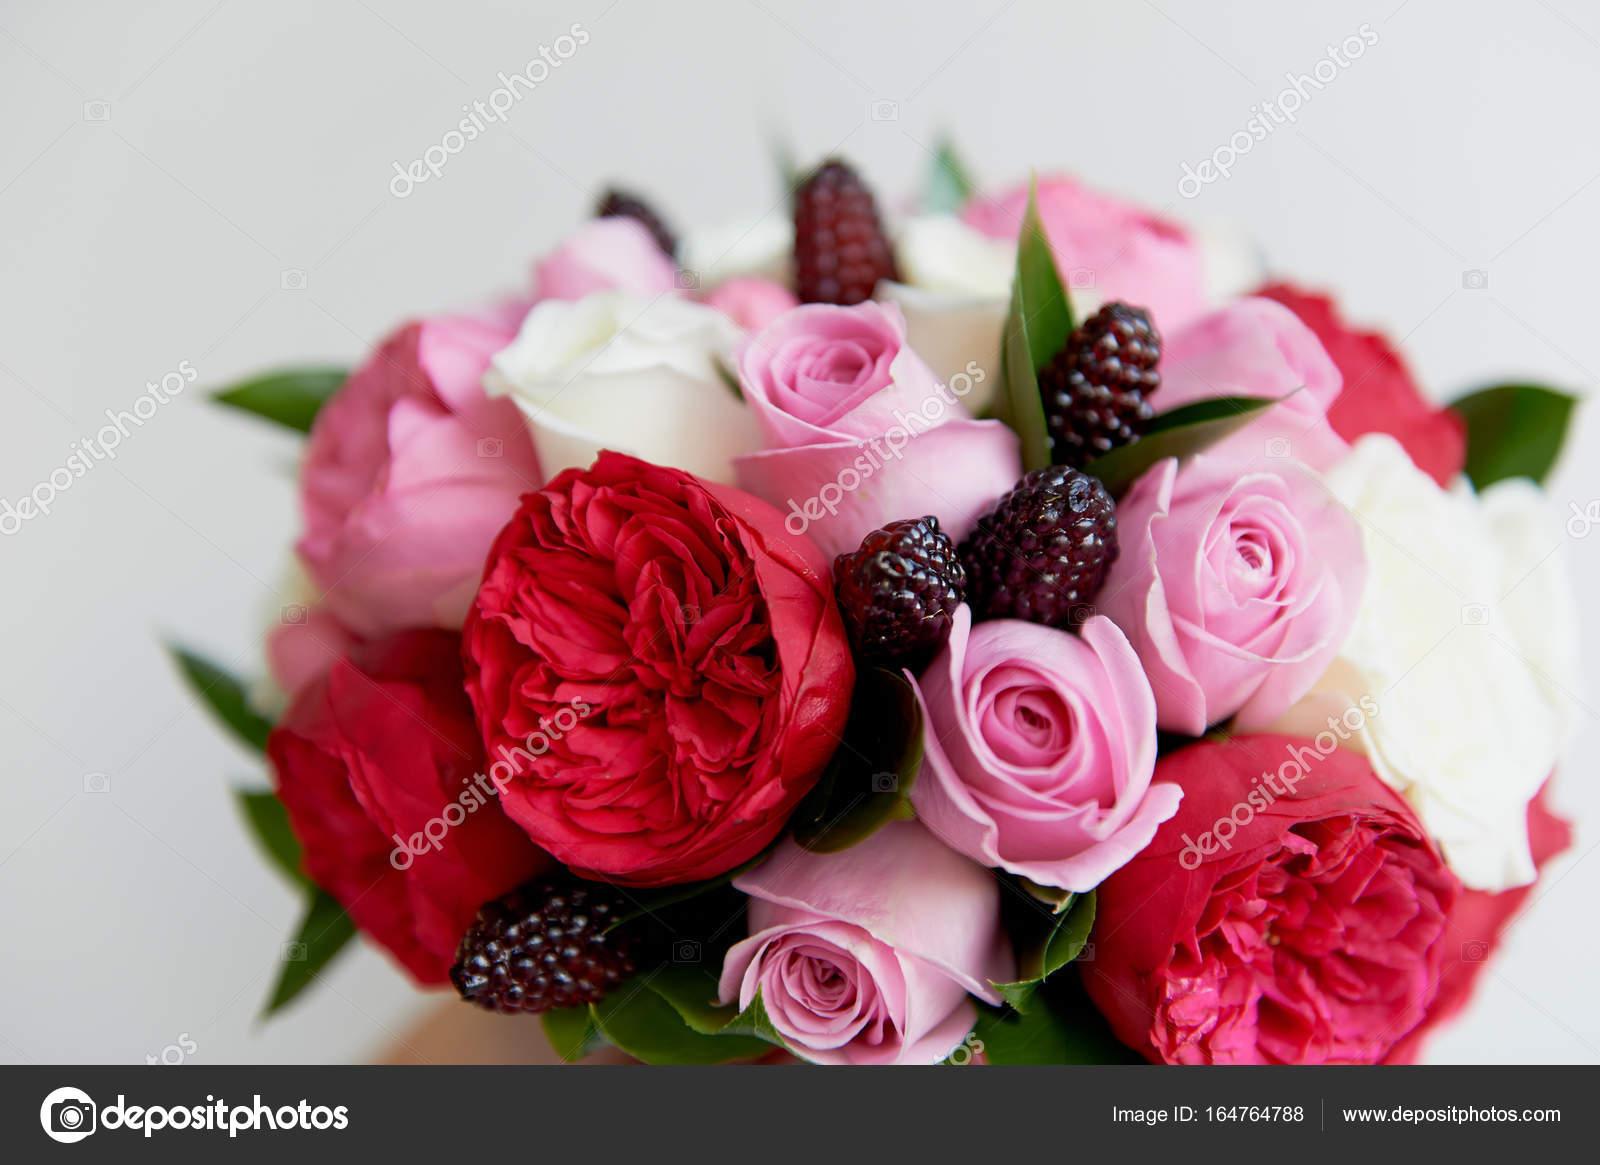 Wedding Bridal Bouquet In Red Pink Whiteding Flowers Wedding